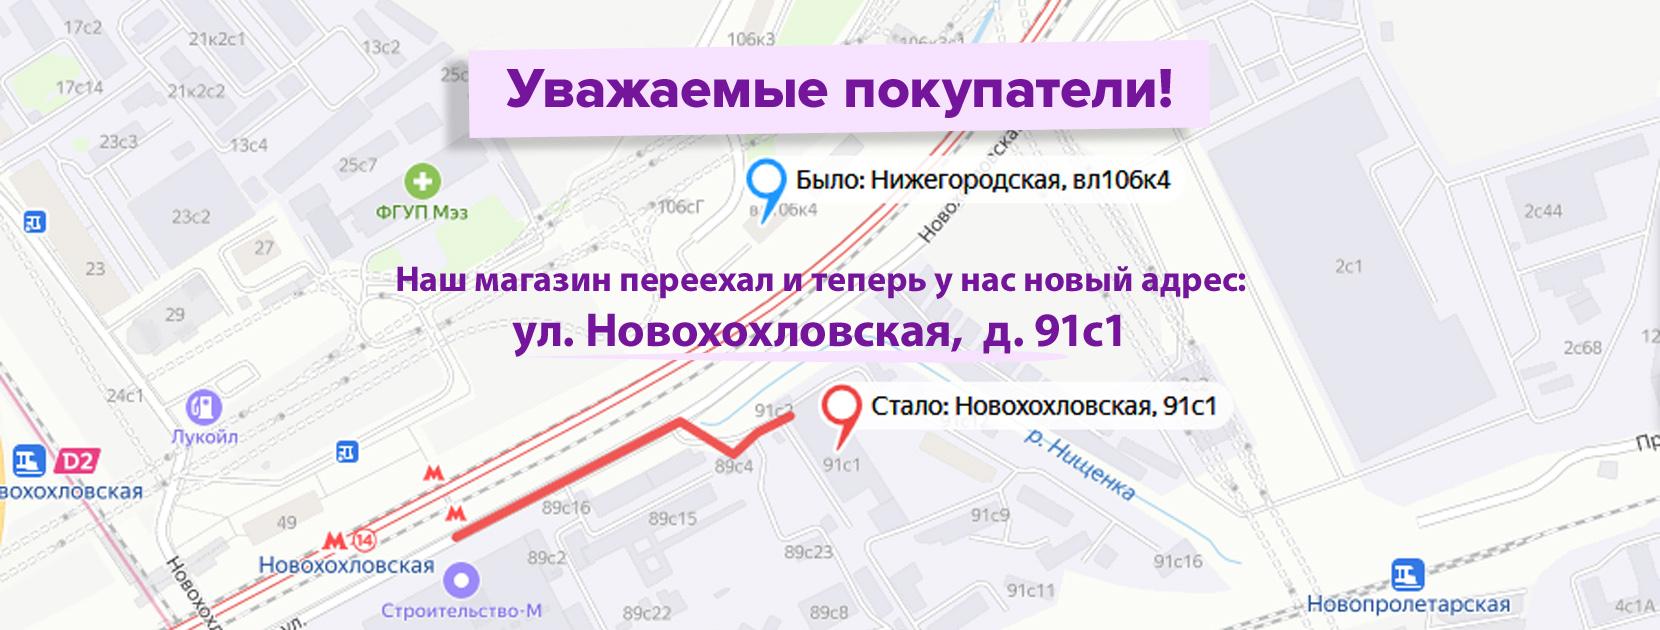 https://www.mytextile.ru/images/slider/new/pereezd-map.jpg